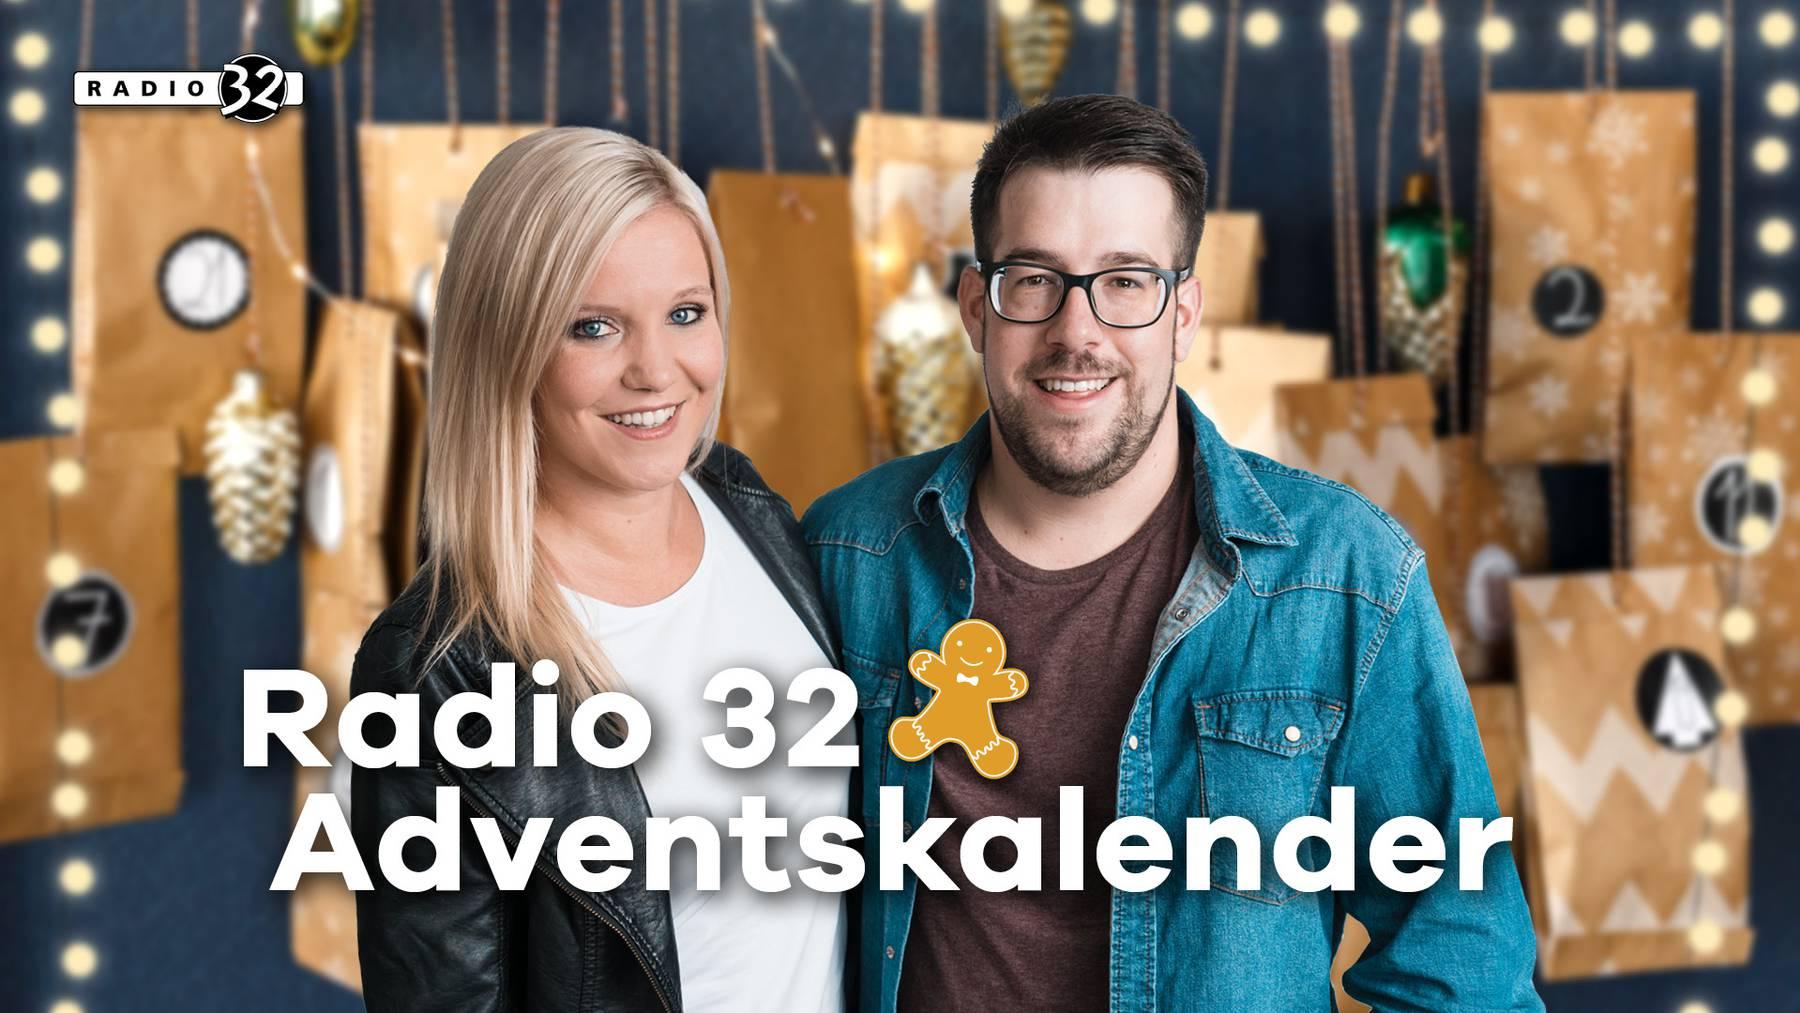 Radio 32 Adventskalender